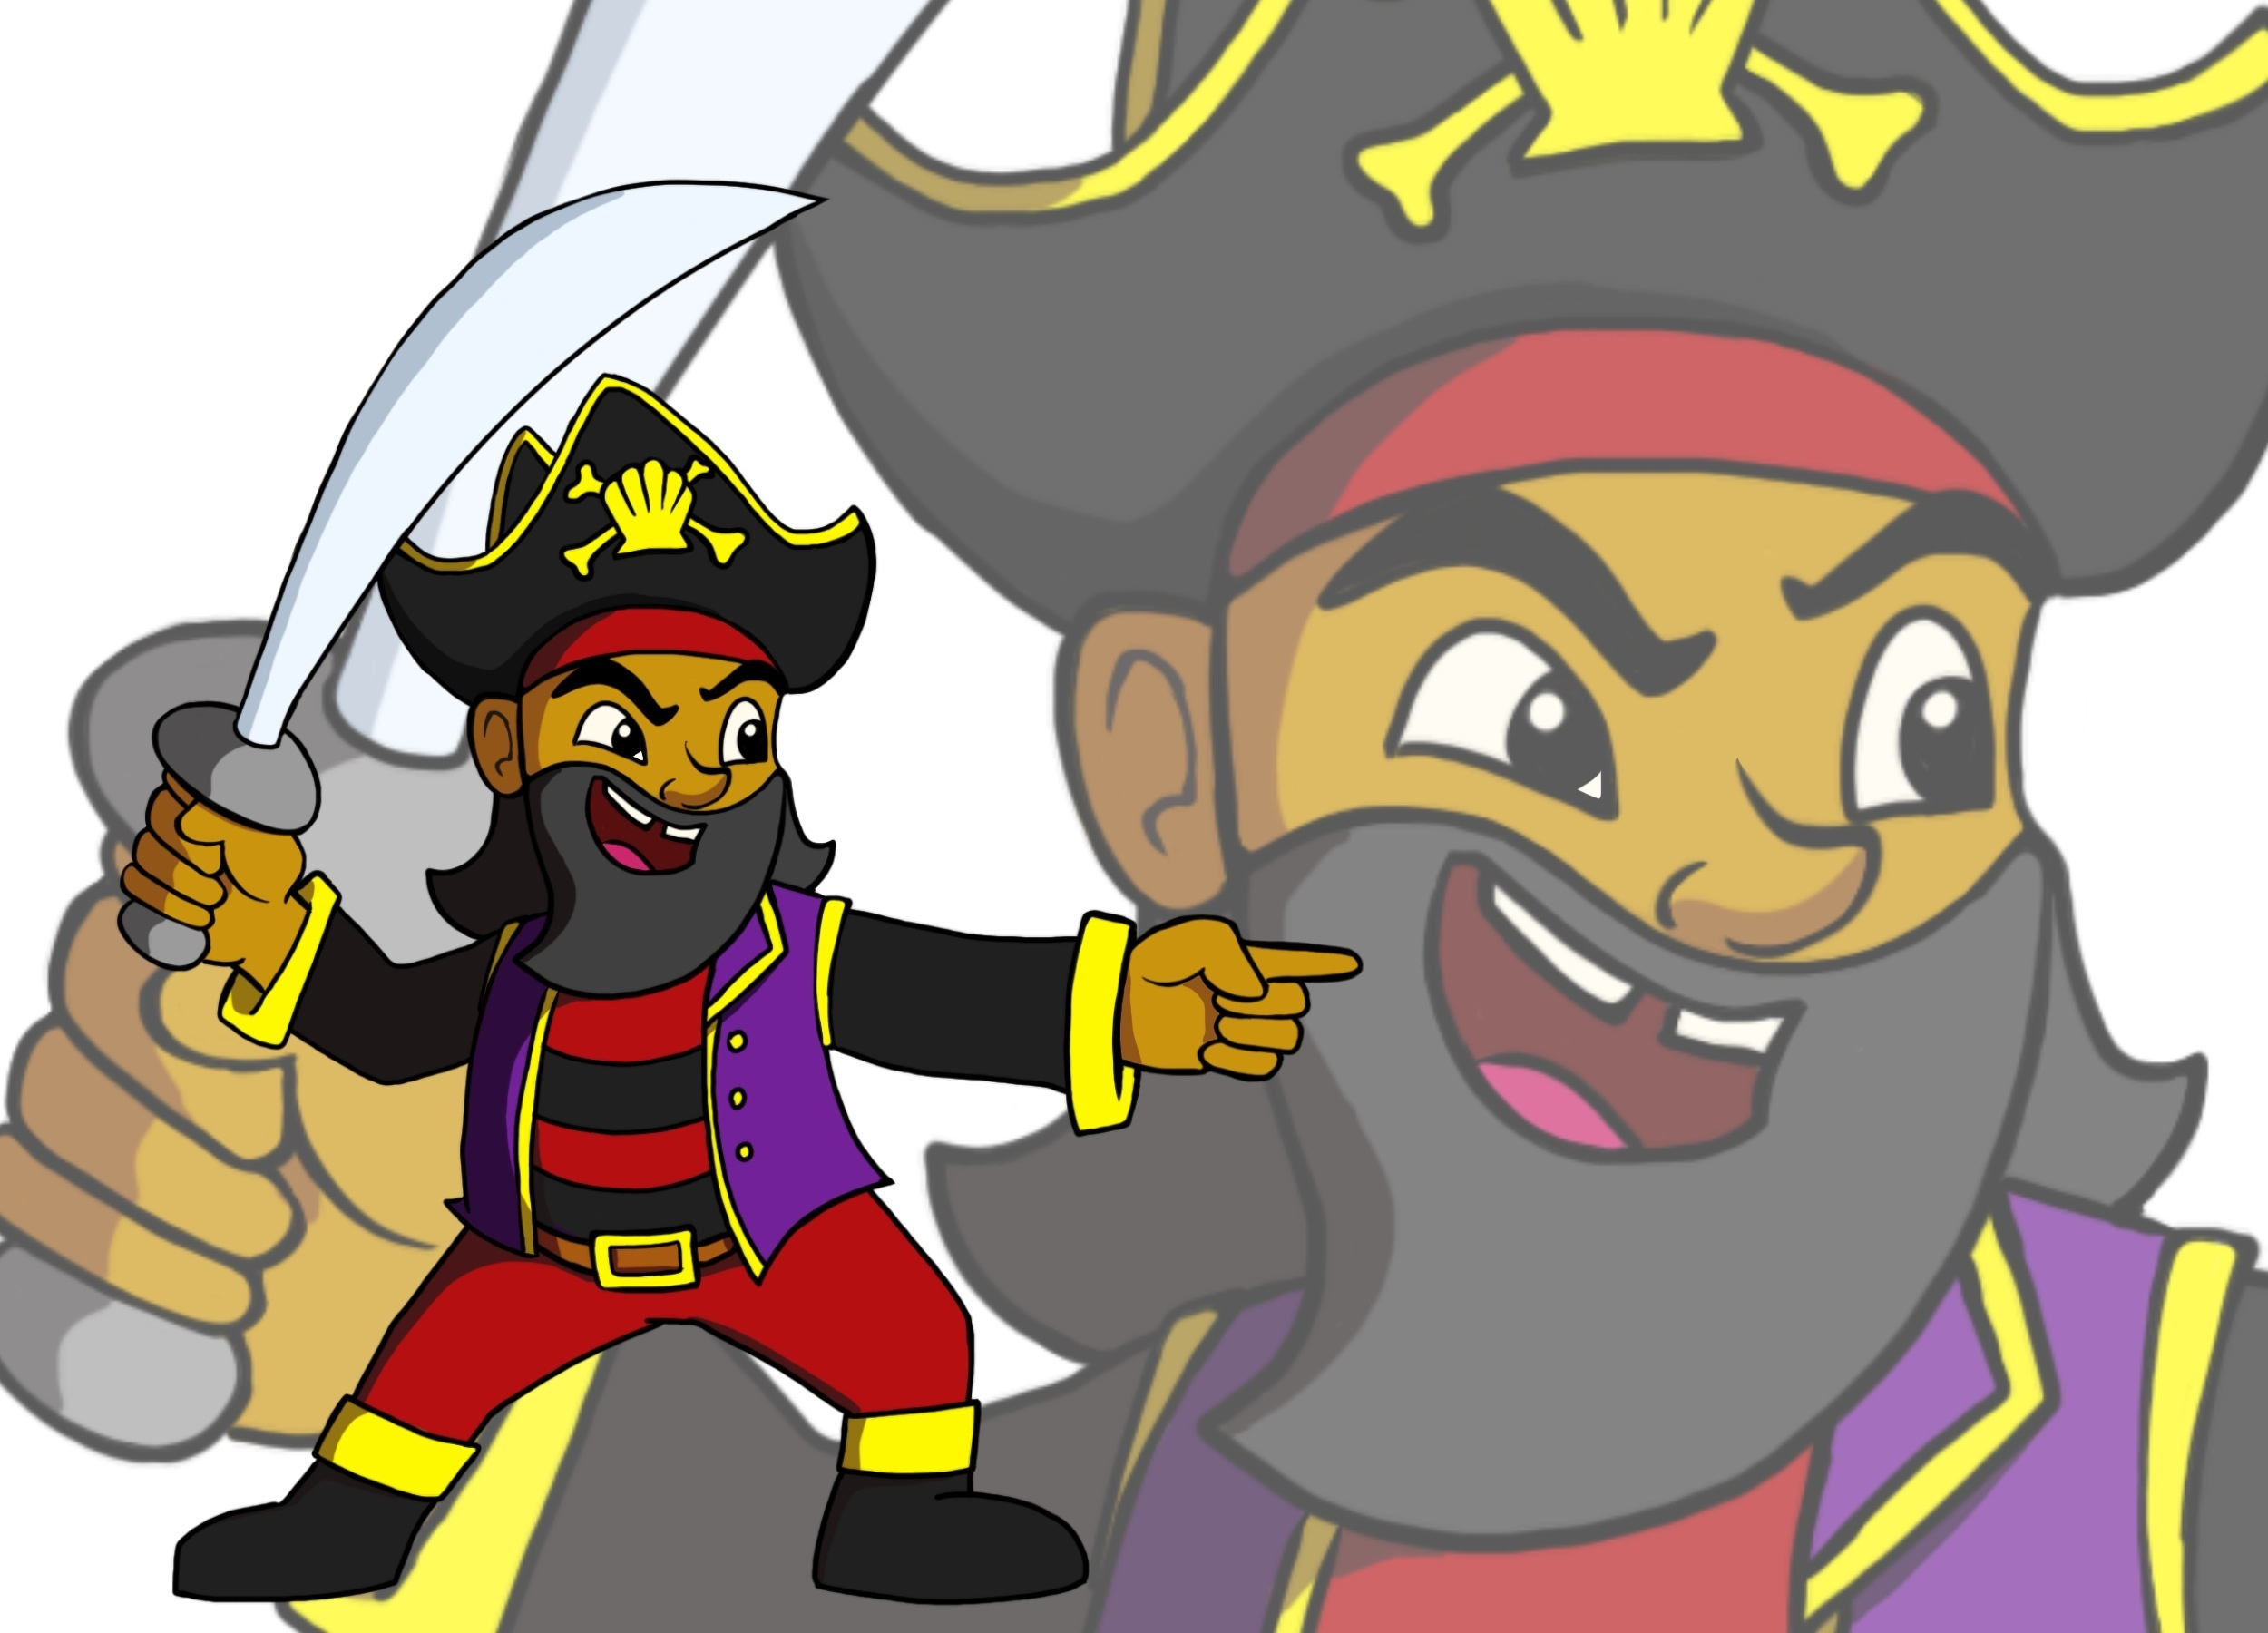 Captin Marlo